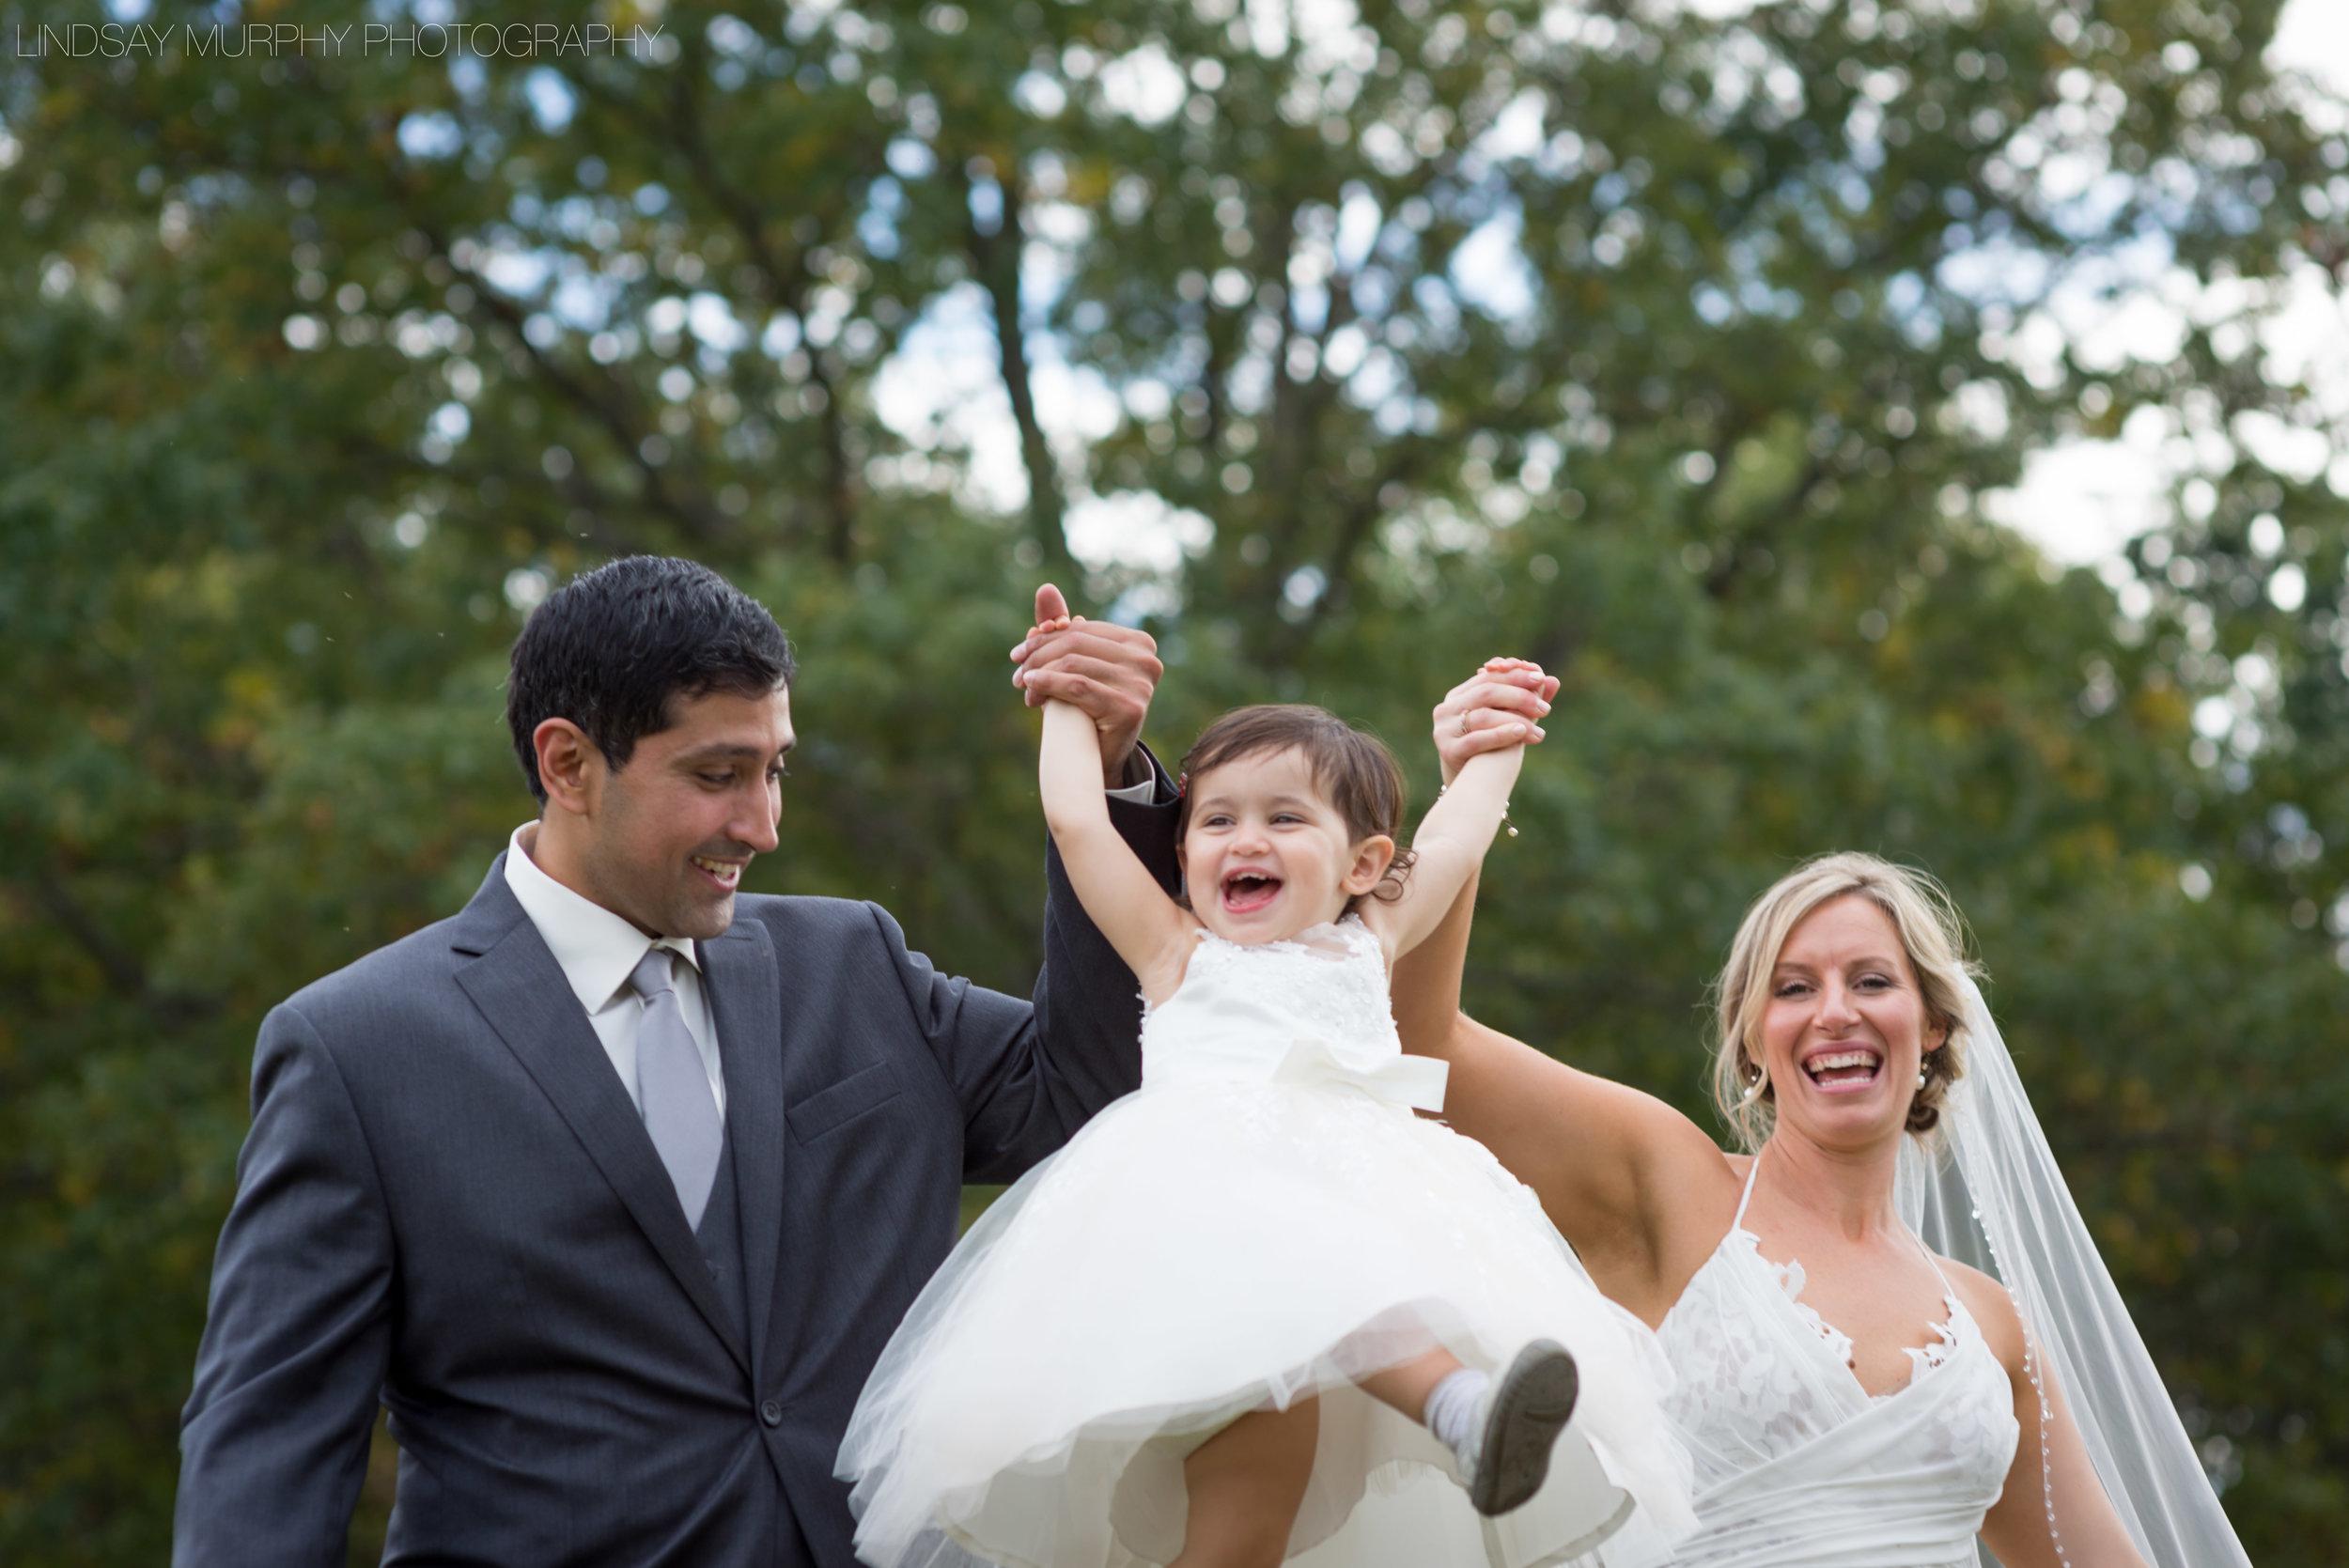 new_england_wedding-106.jpg